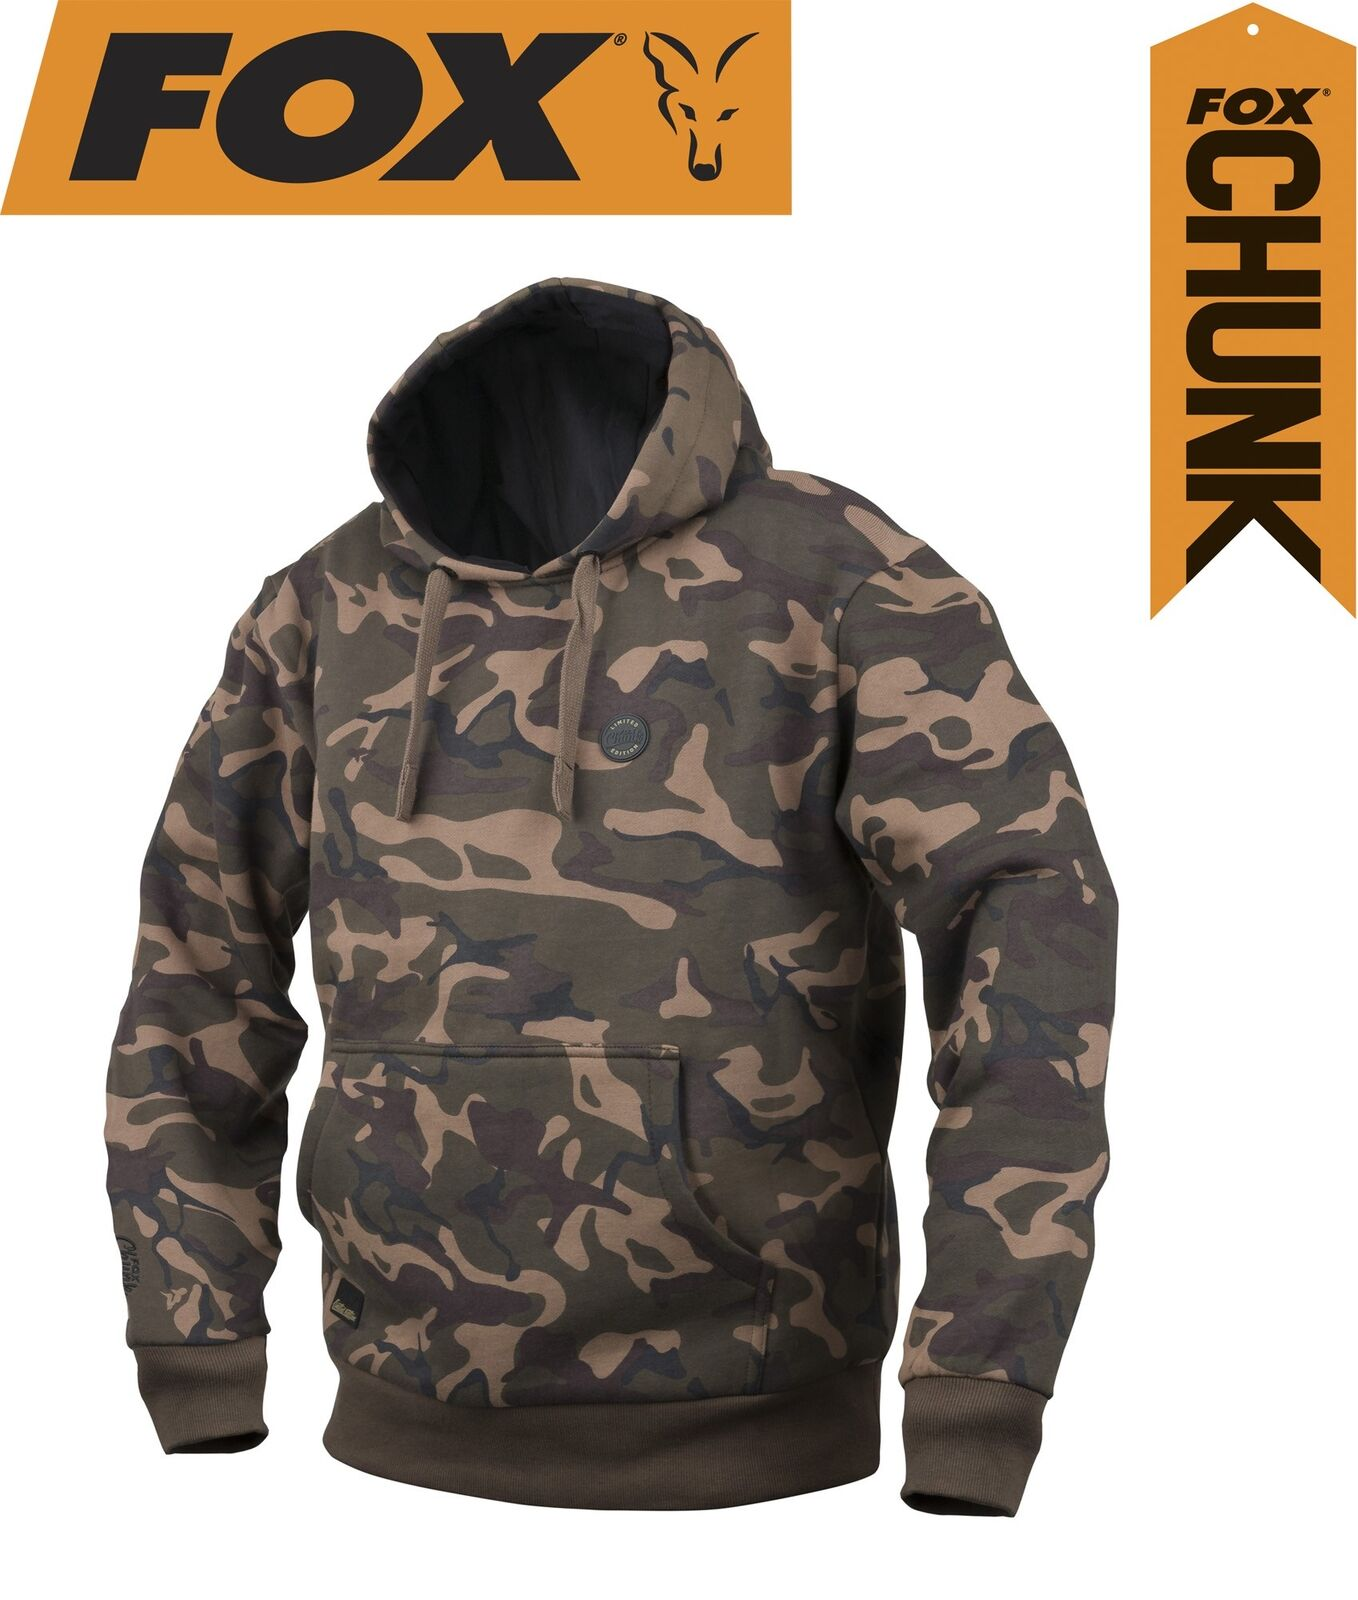 Fox Fox Fox Chunk Camo Lined Hoody Pullover Angelpullover Kapuzenpulli Angelkleidung 149ae1